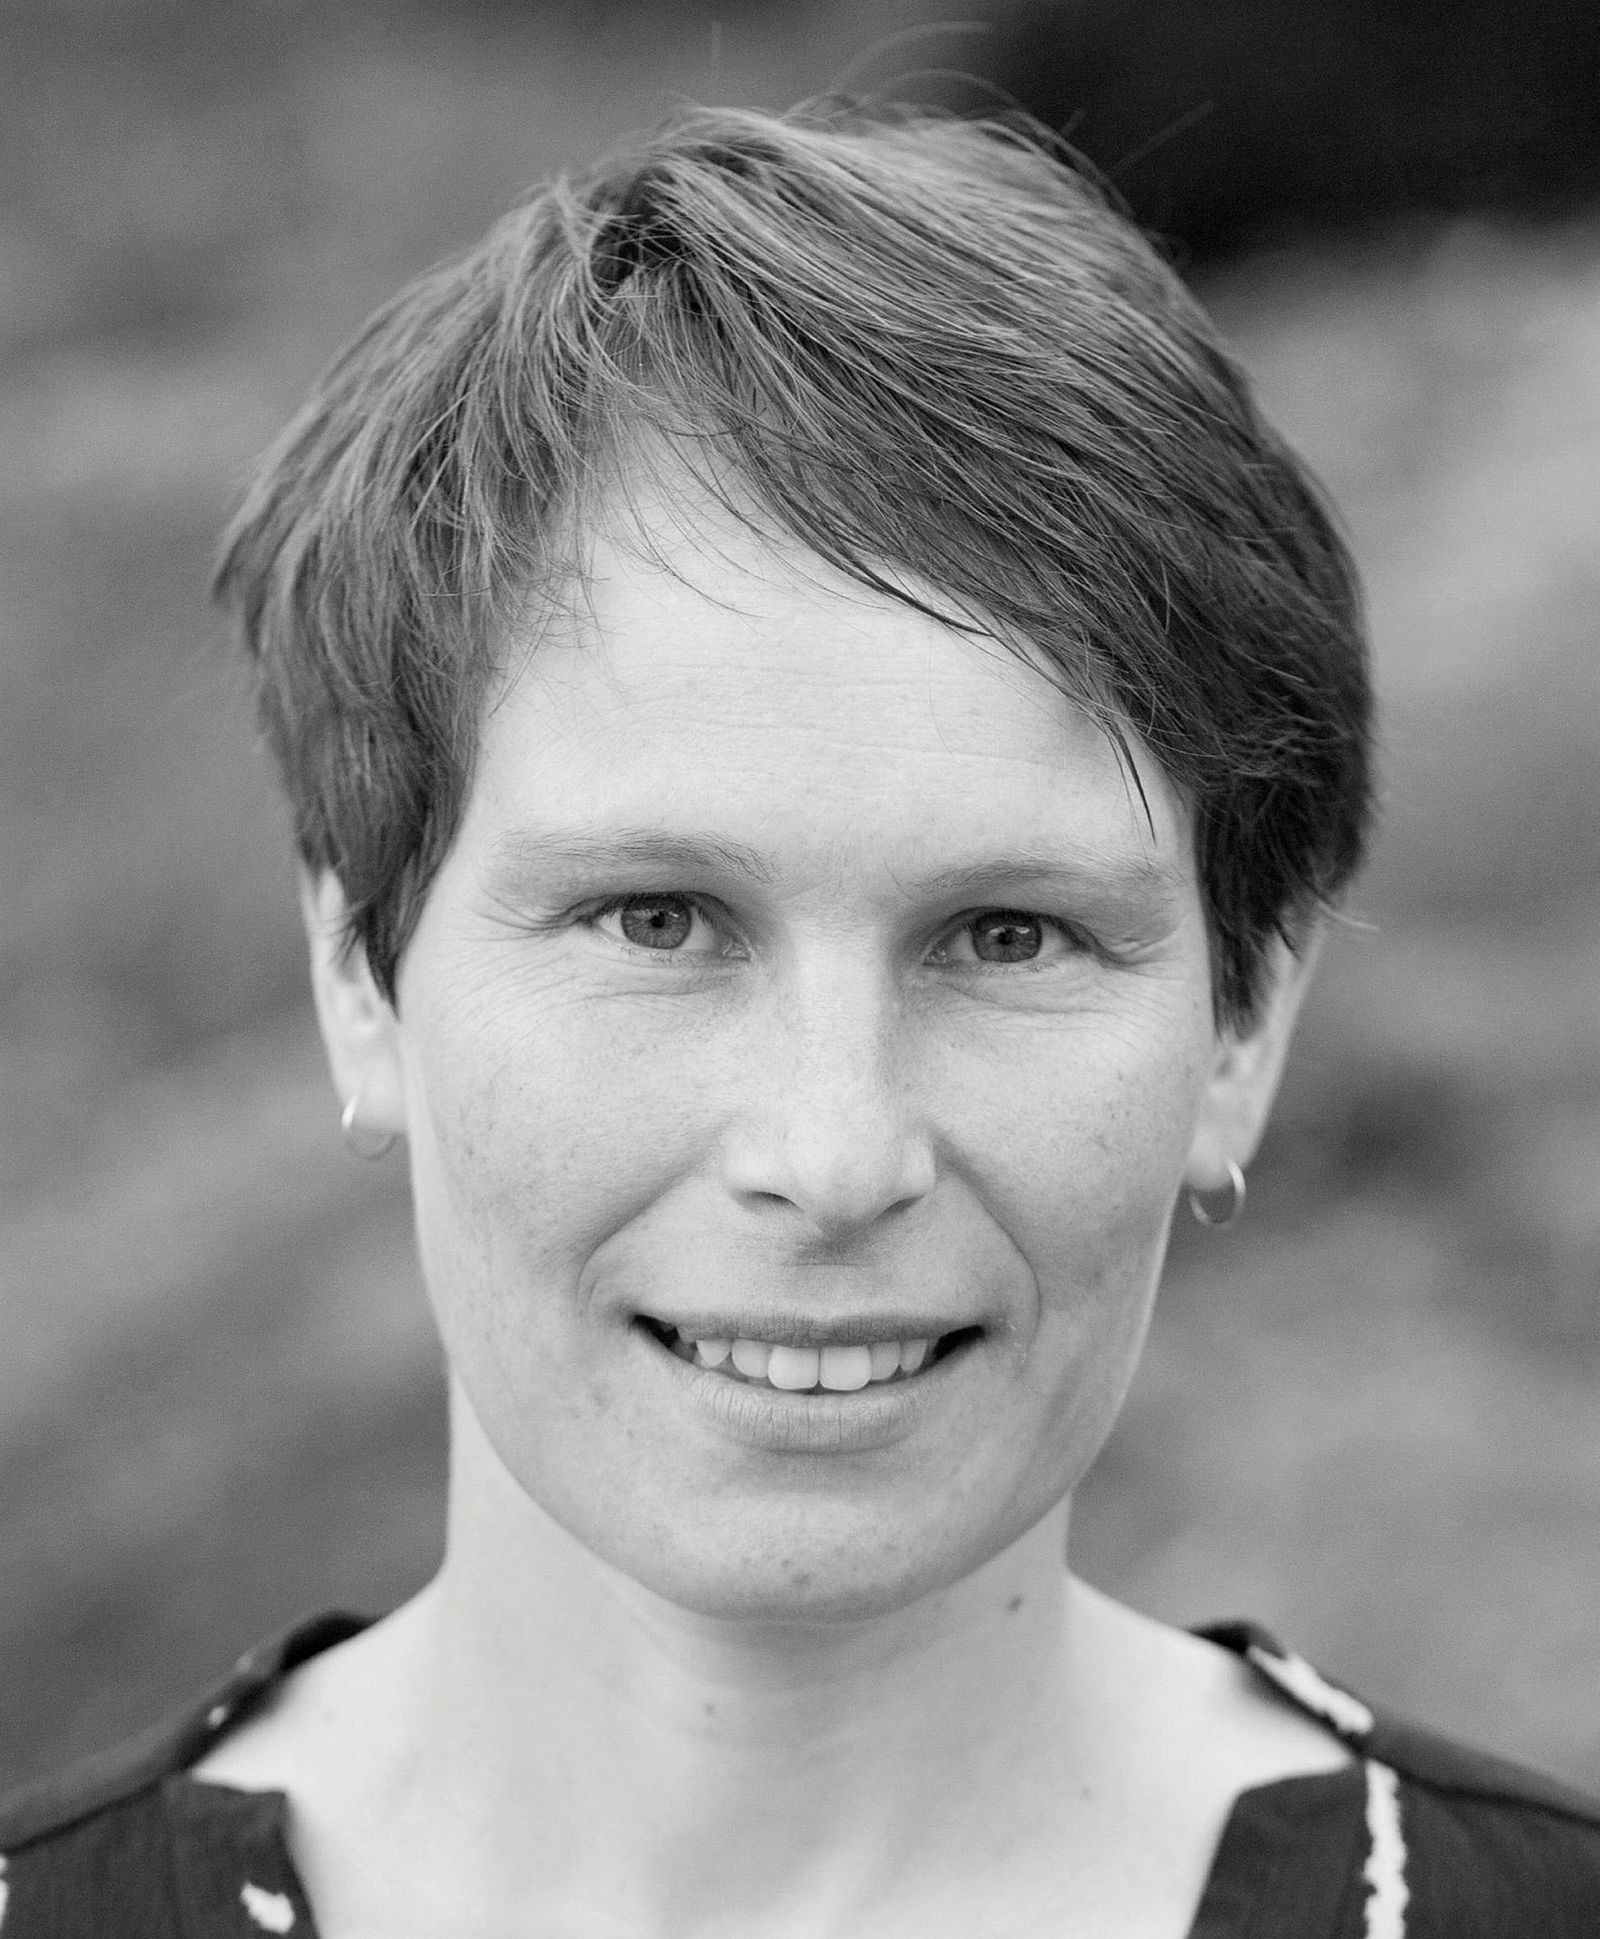 Linda Nøstbakken